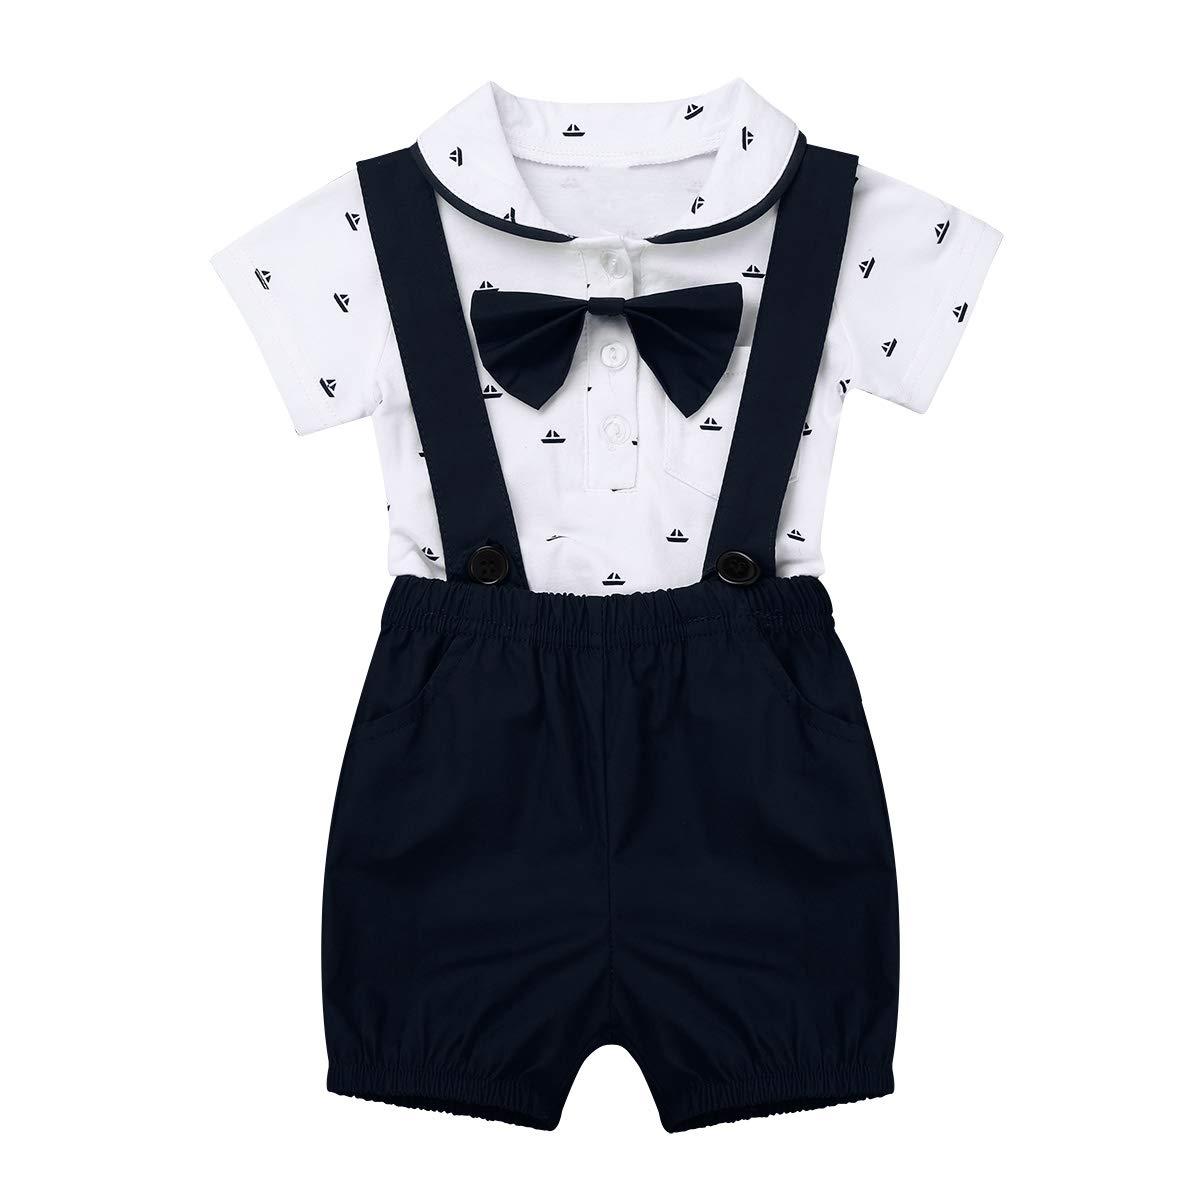 FEESHOW Toddler Baby Boys Gentleman Outfits Short Sleeve Romper Bodysuit Top Suspender Bib Pants+Bow Tie 3Pcs Set